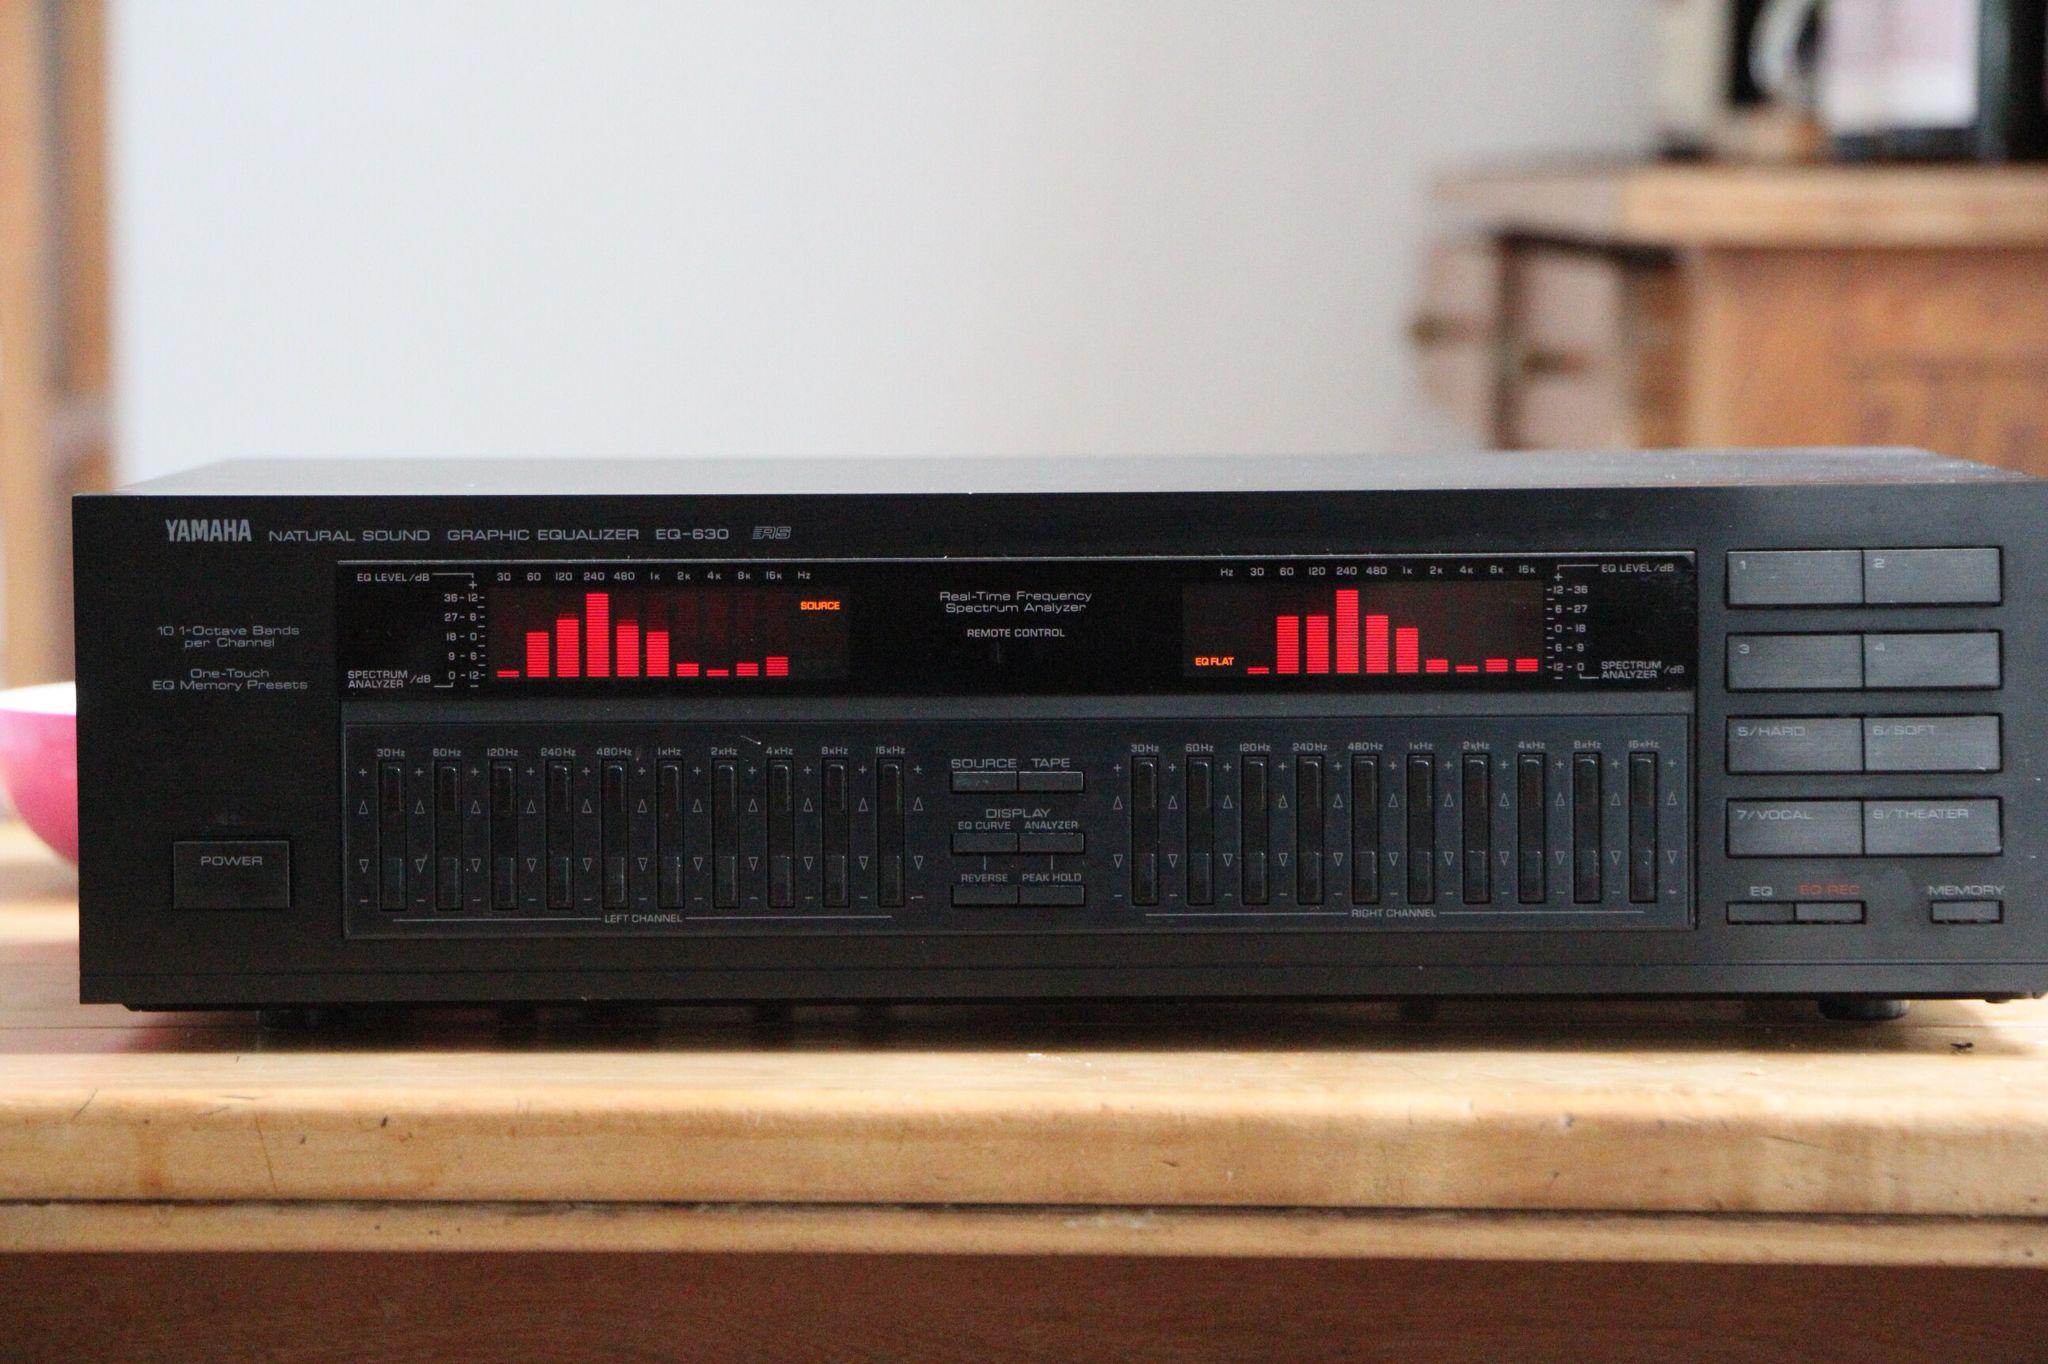 Yamaha Eq630 Vintage Audio Love Yamaha Audio Hifi Audio Hifi